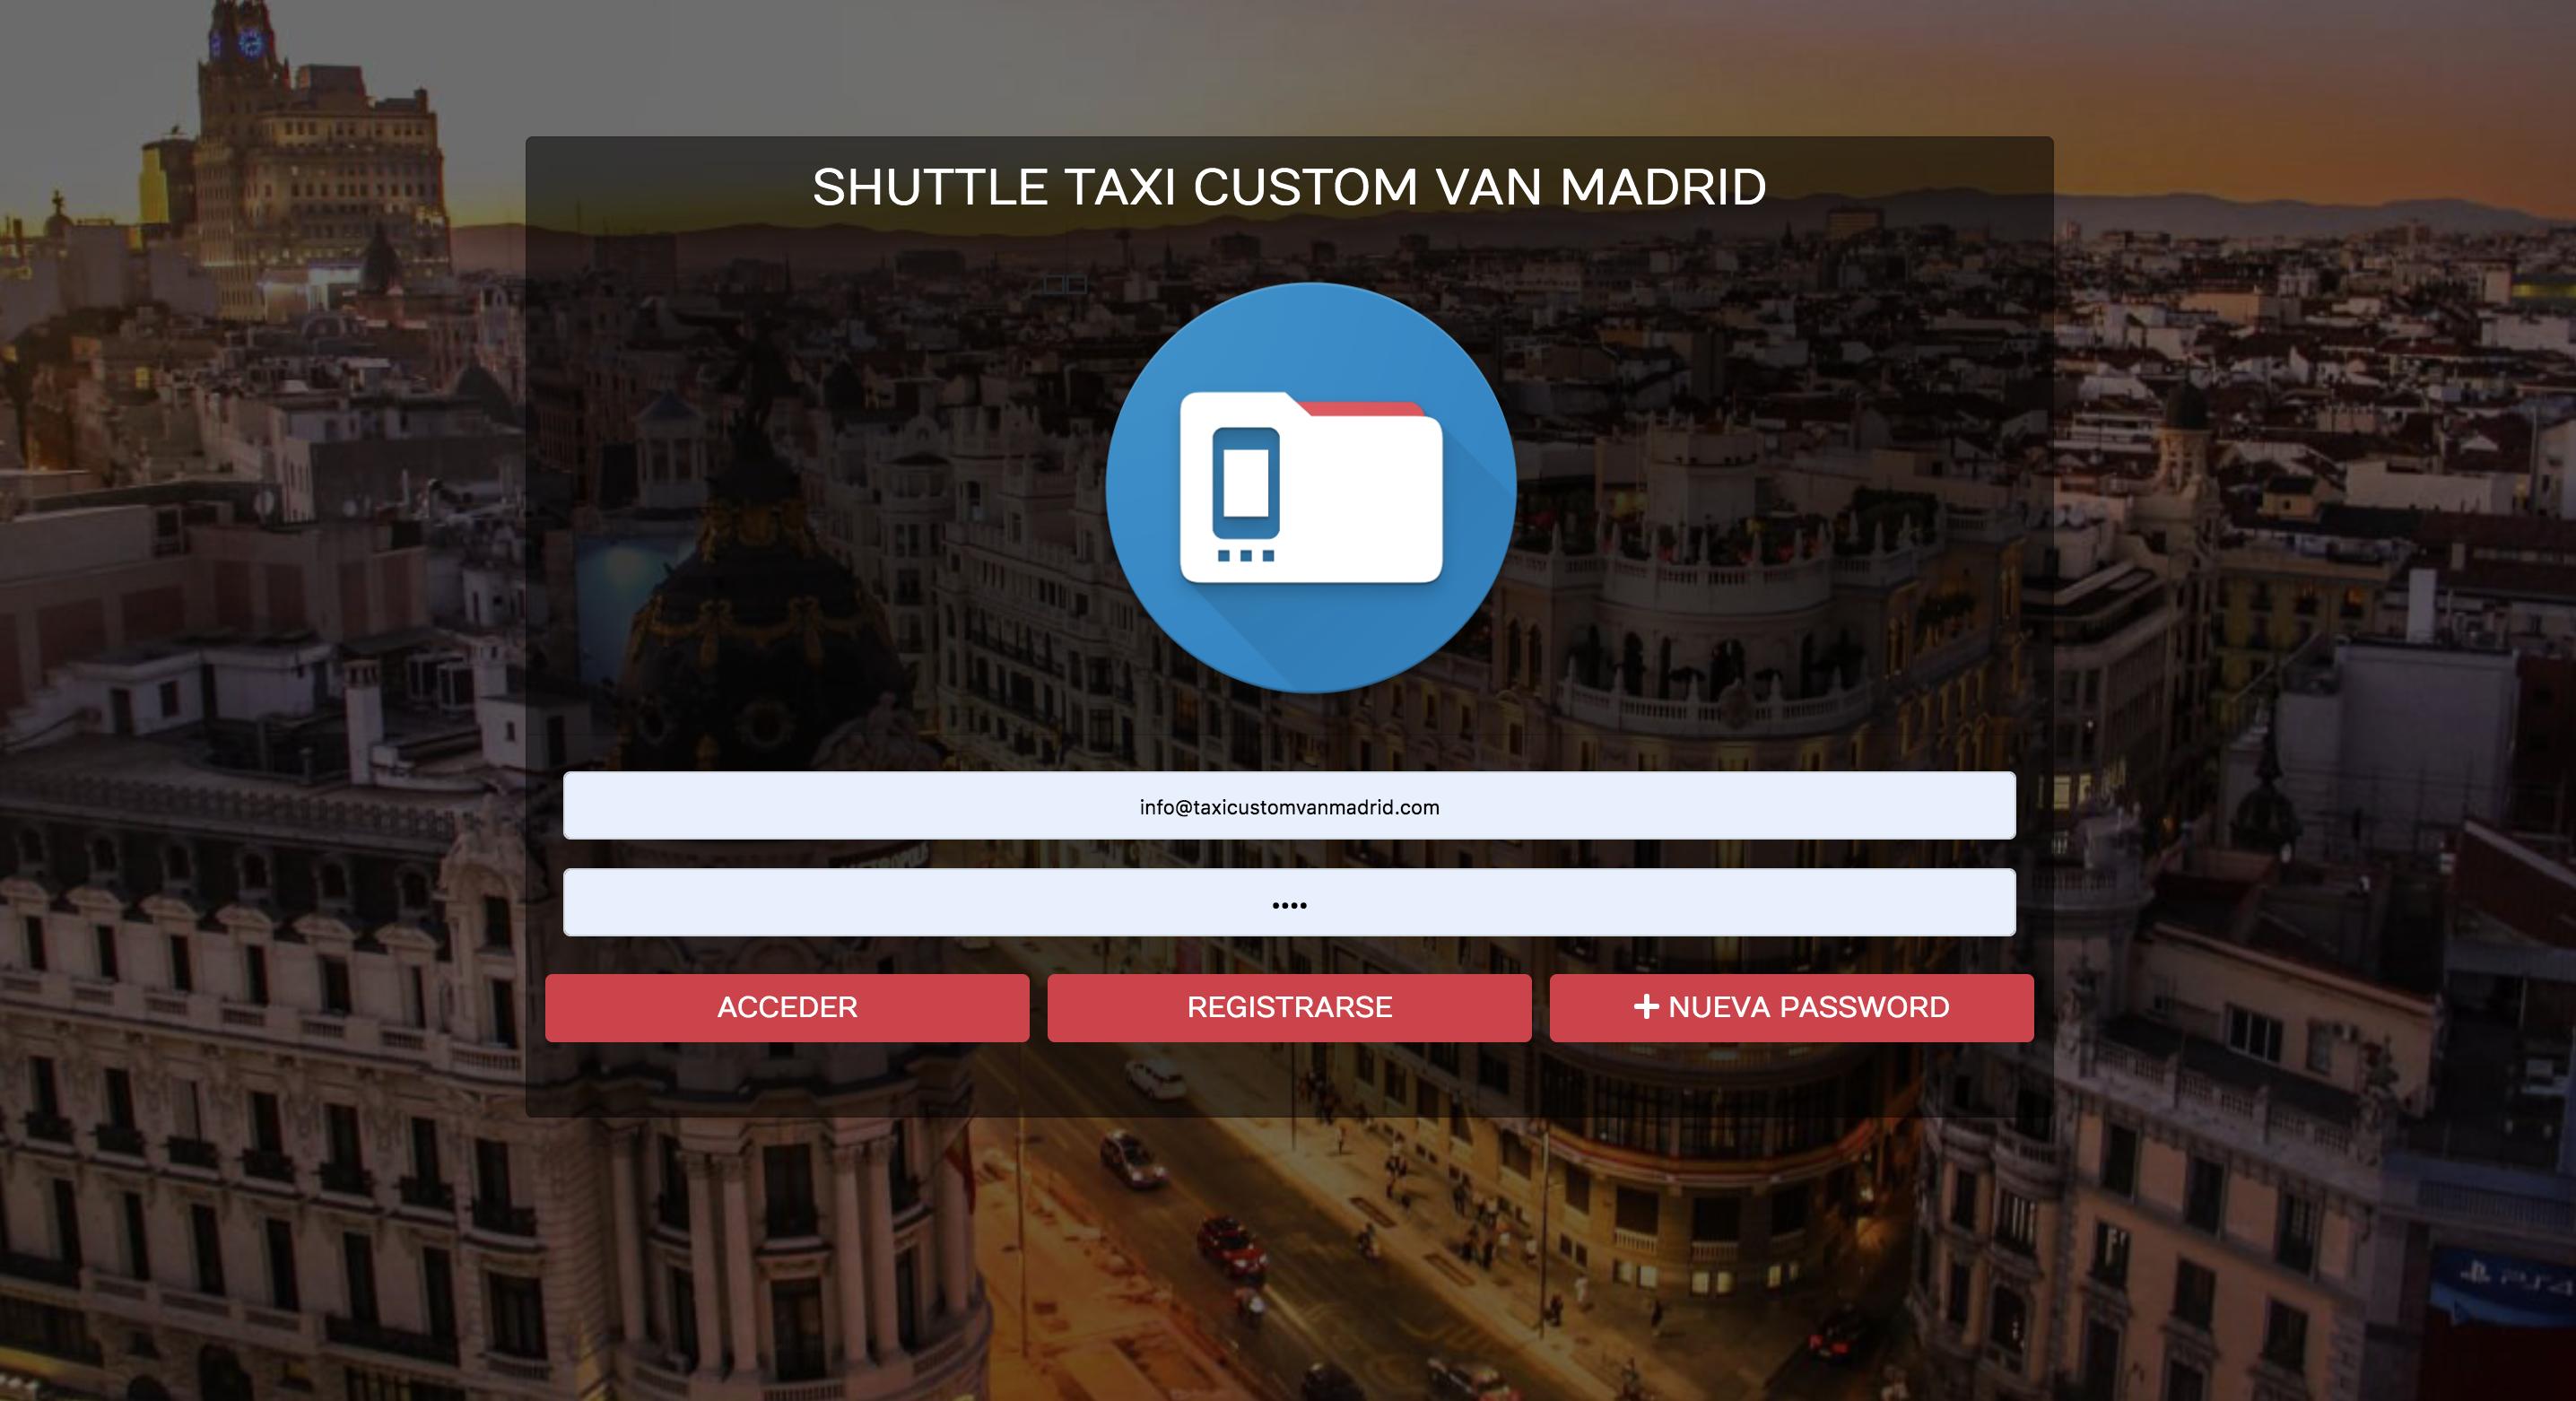 imagen del login para reservar shuttle lanzadera de custom van info